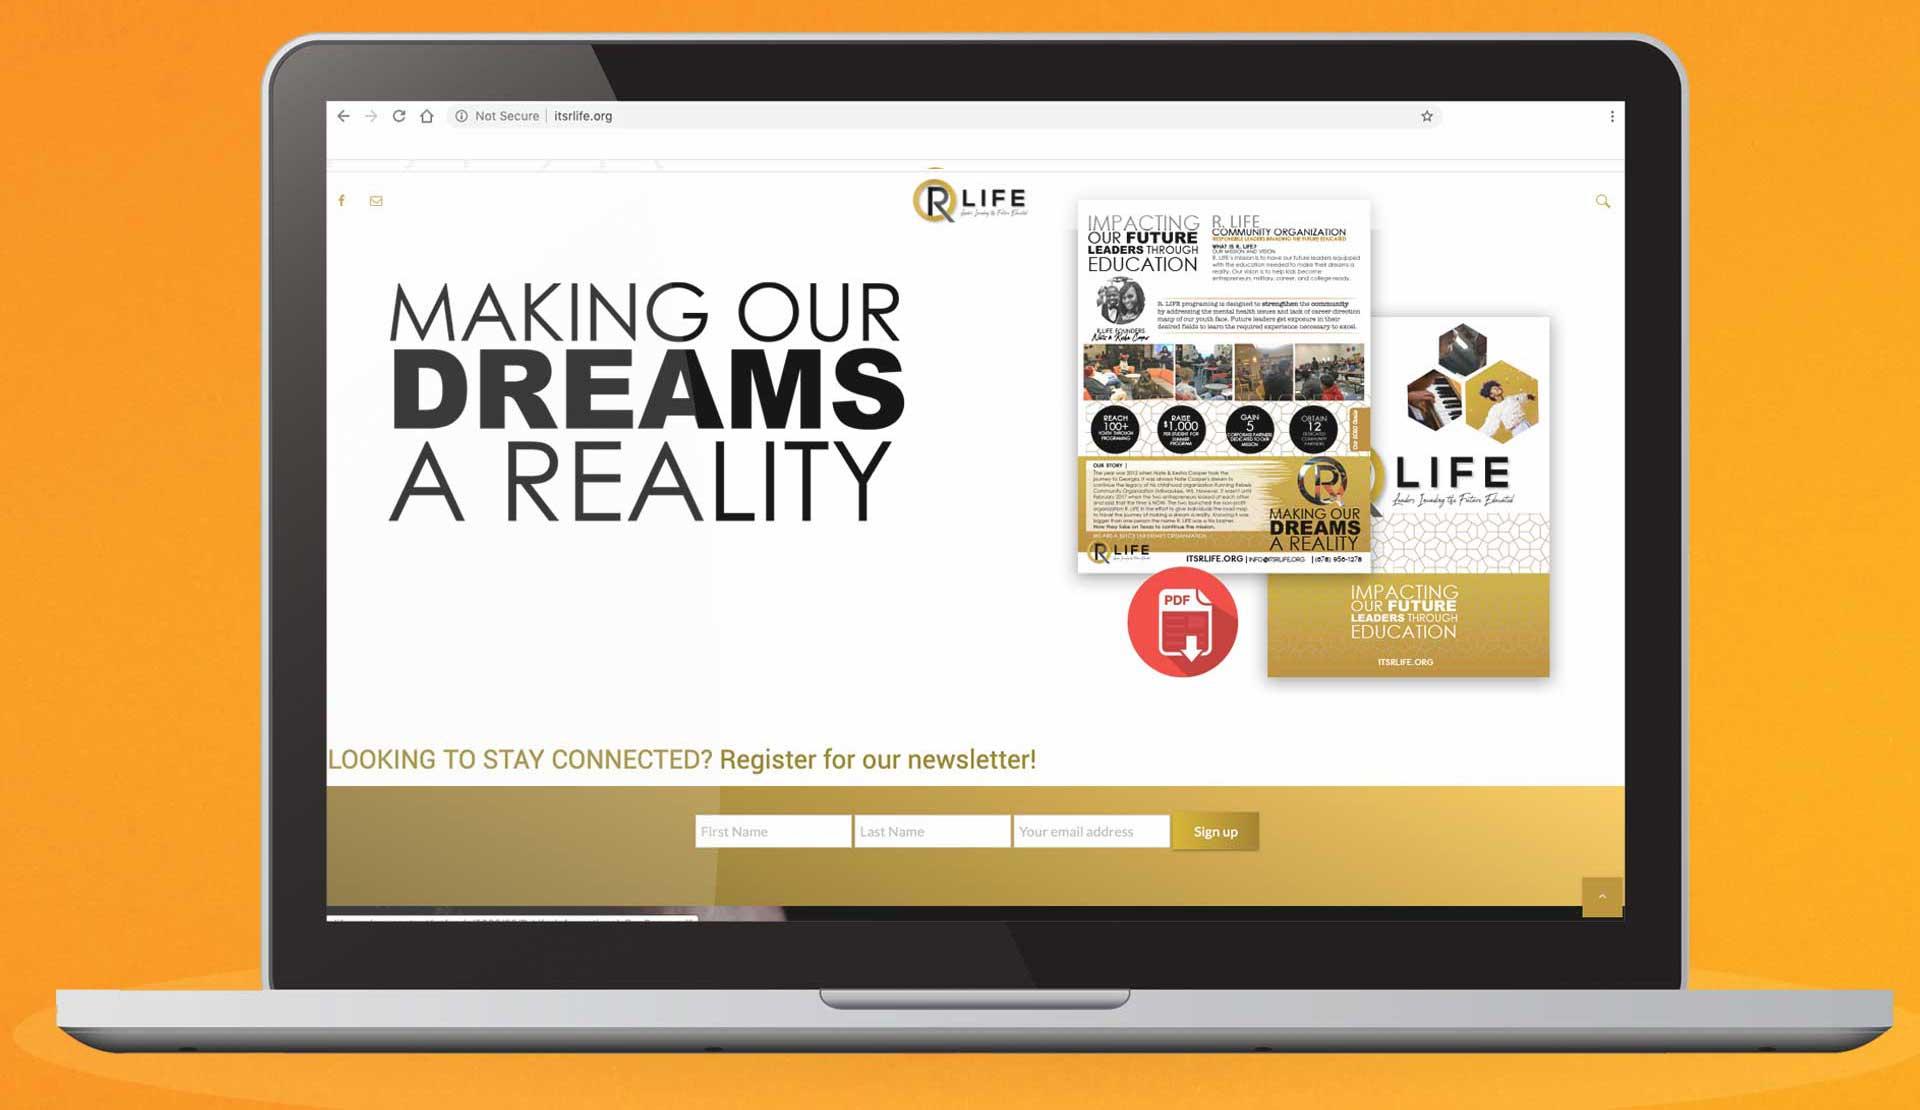 R LIFE Community Organization Non Profit Website Design